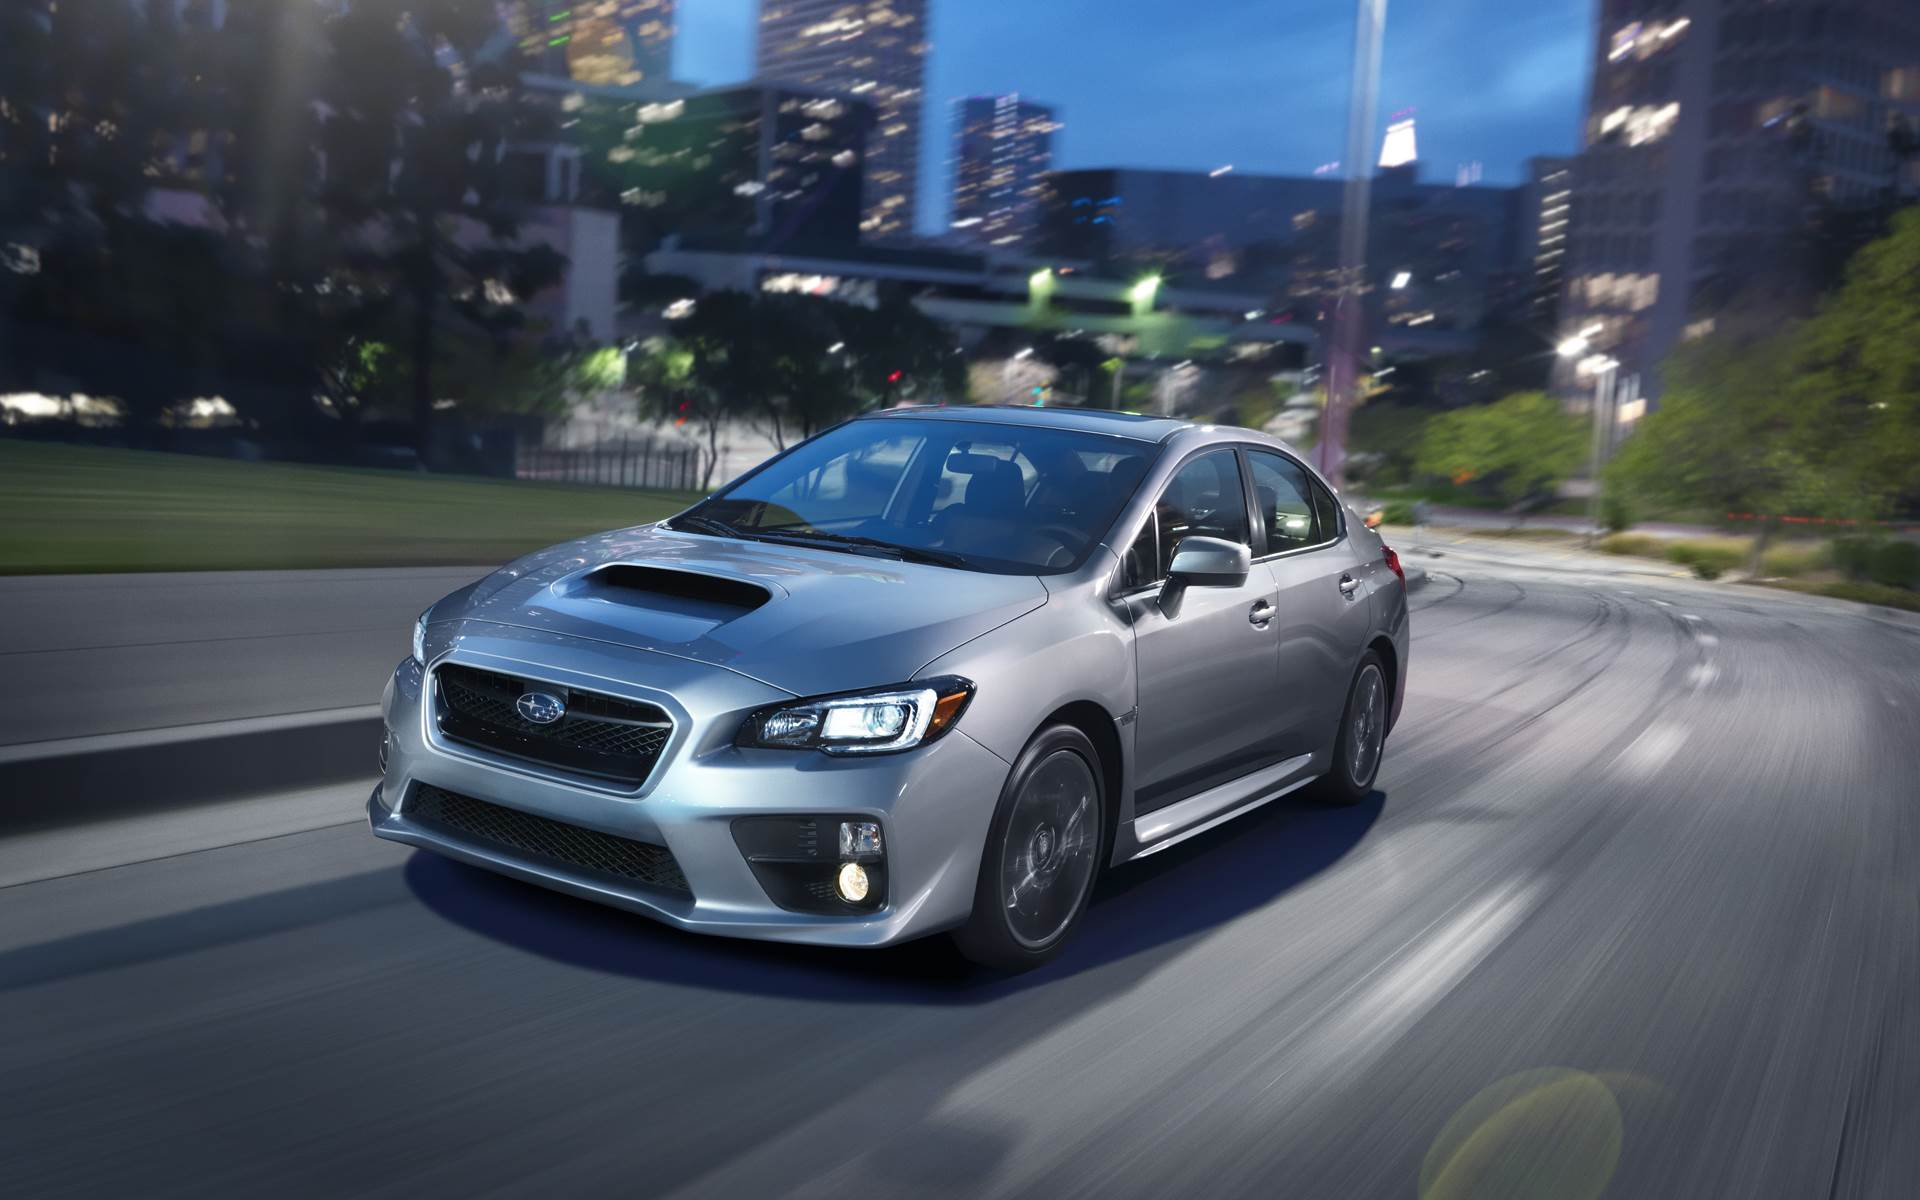 Subaru Wrx Lease >> 2020 Subaru Wrx Sedan Eternity Leasing 954 888 8202